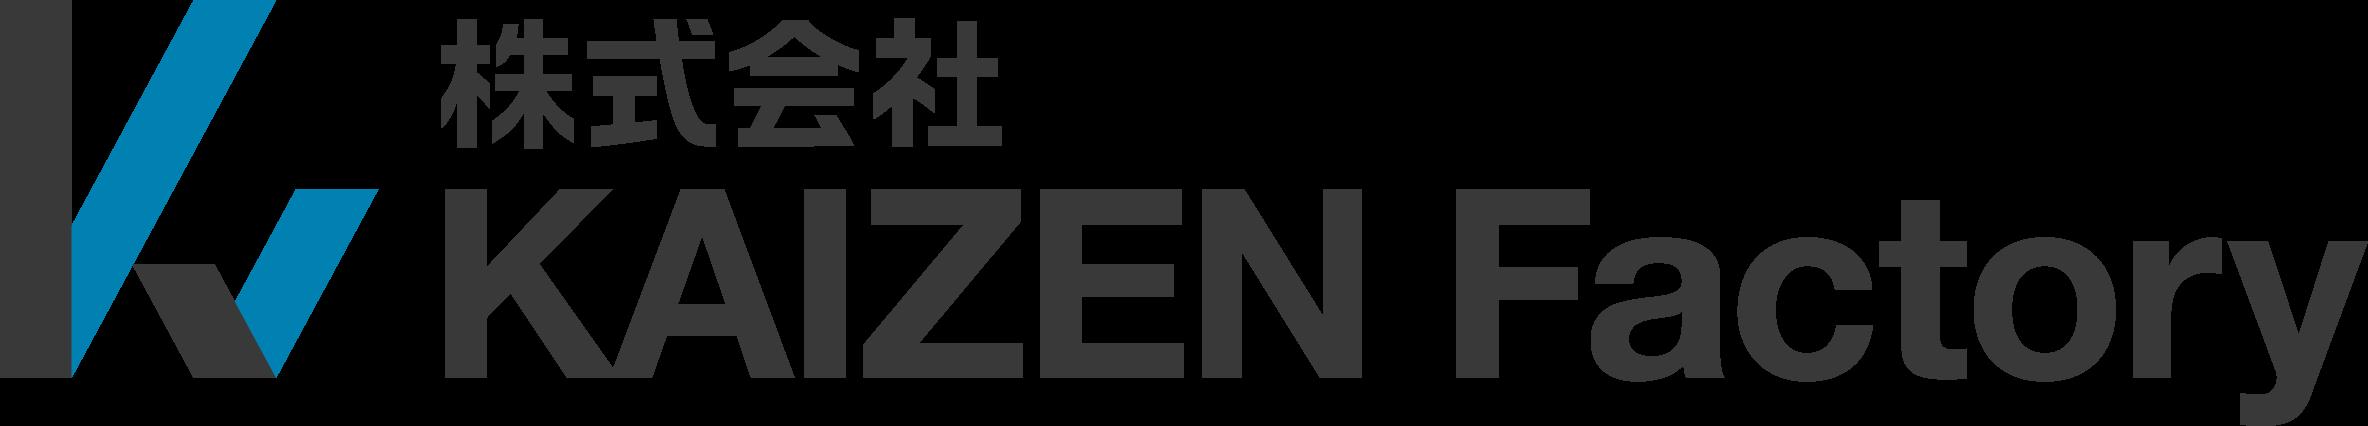 株式会社KAIZEN Factory